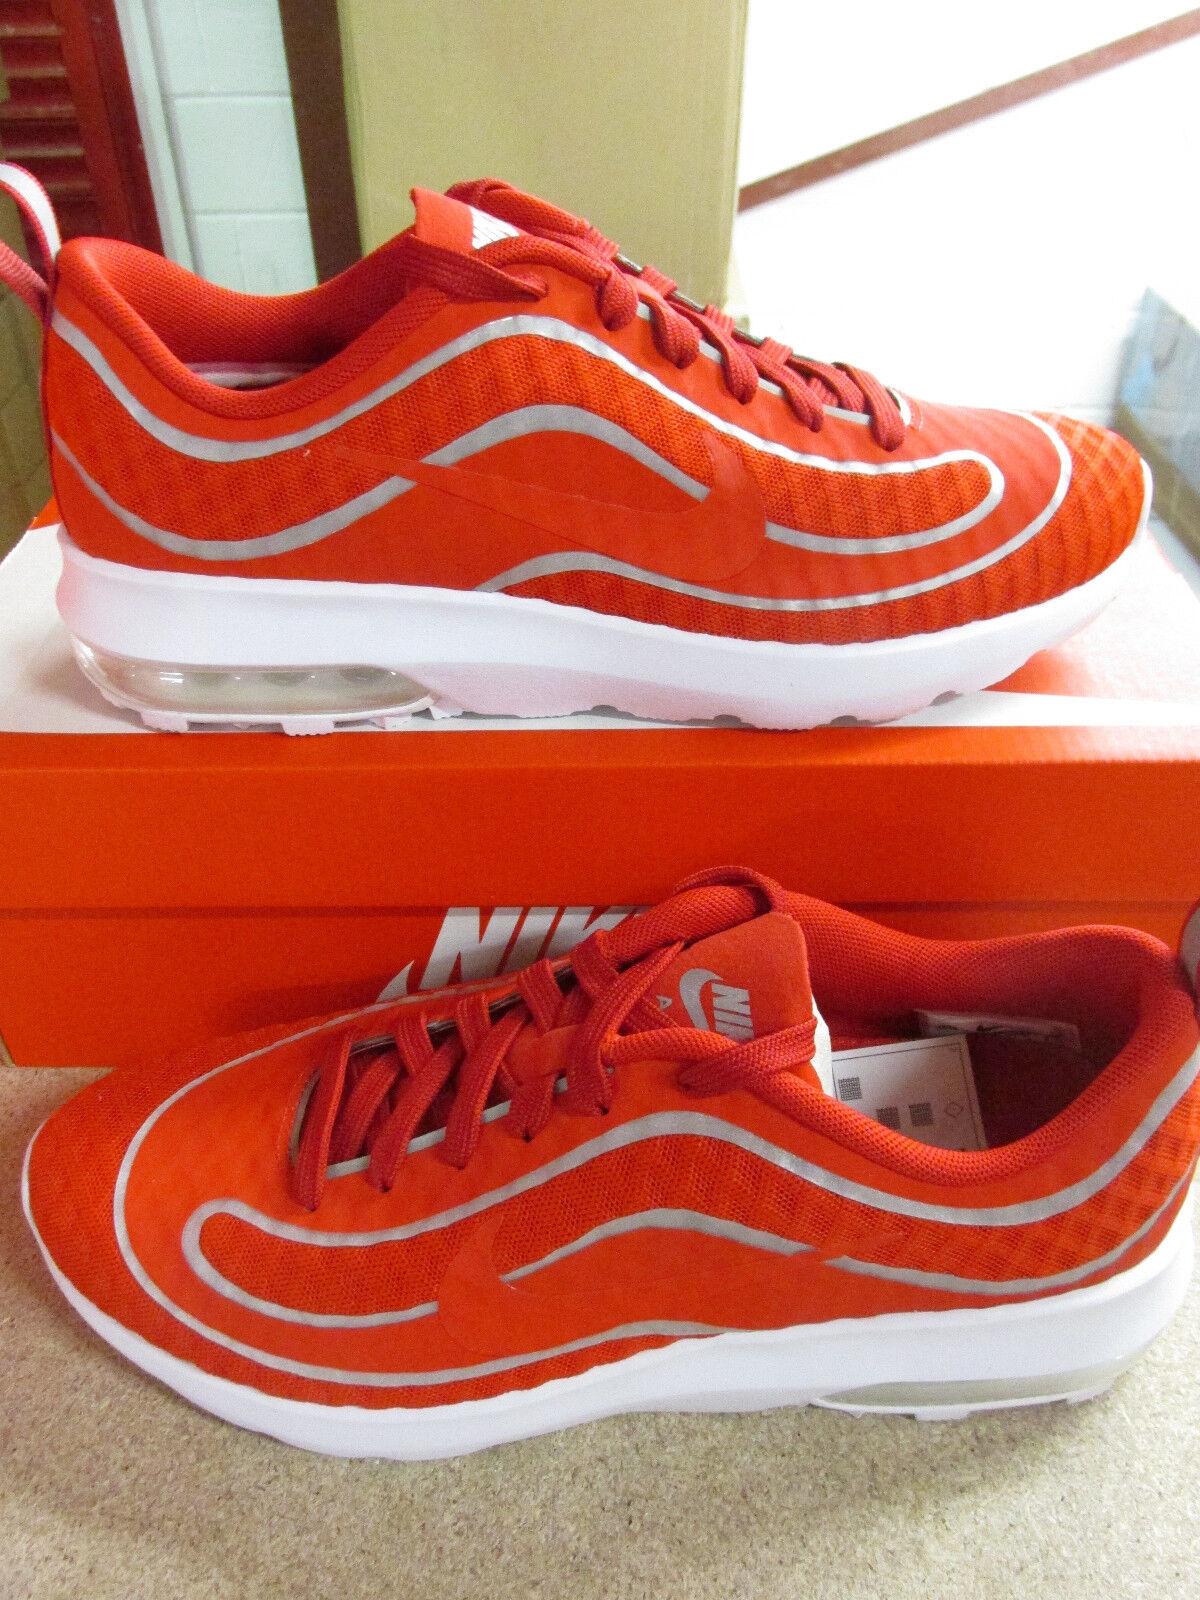 Nike Air Max Mercurial 98 Mens Running Trainers 818675 600 Sneakers Shoes